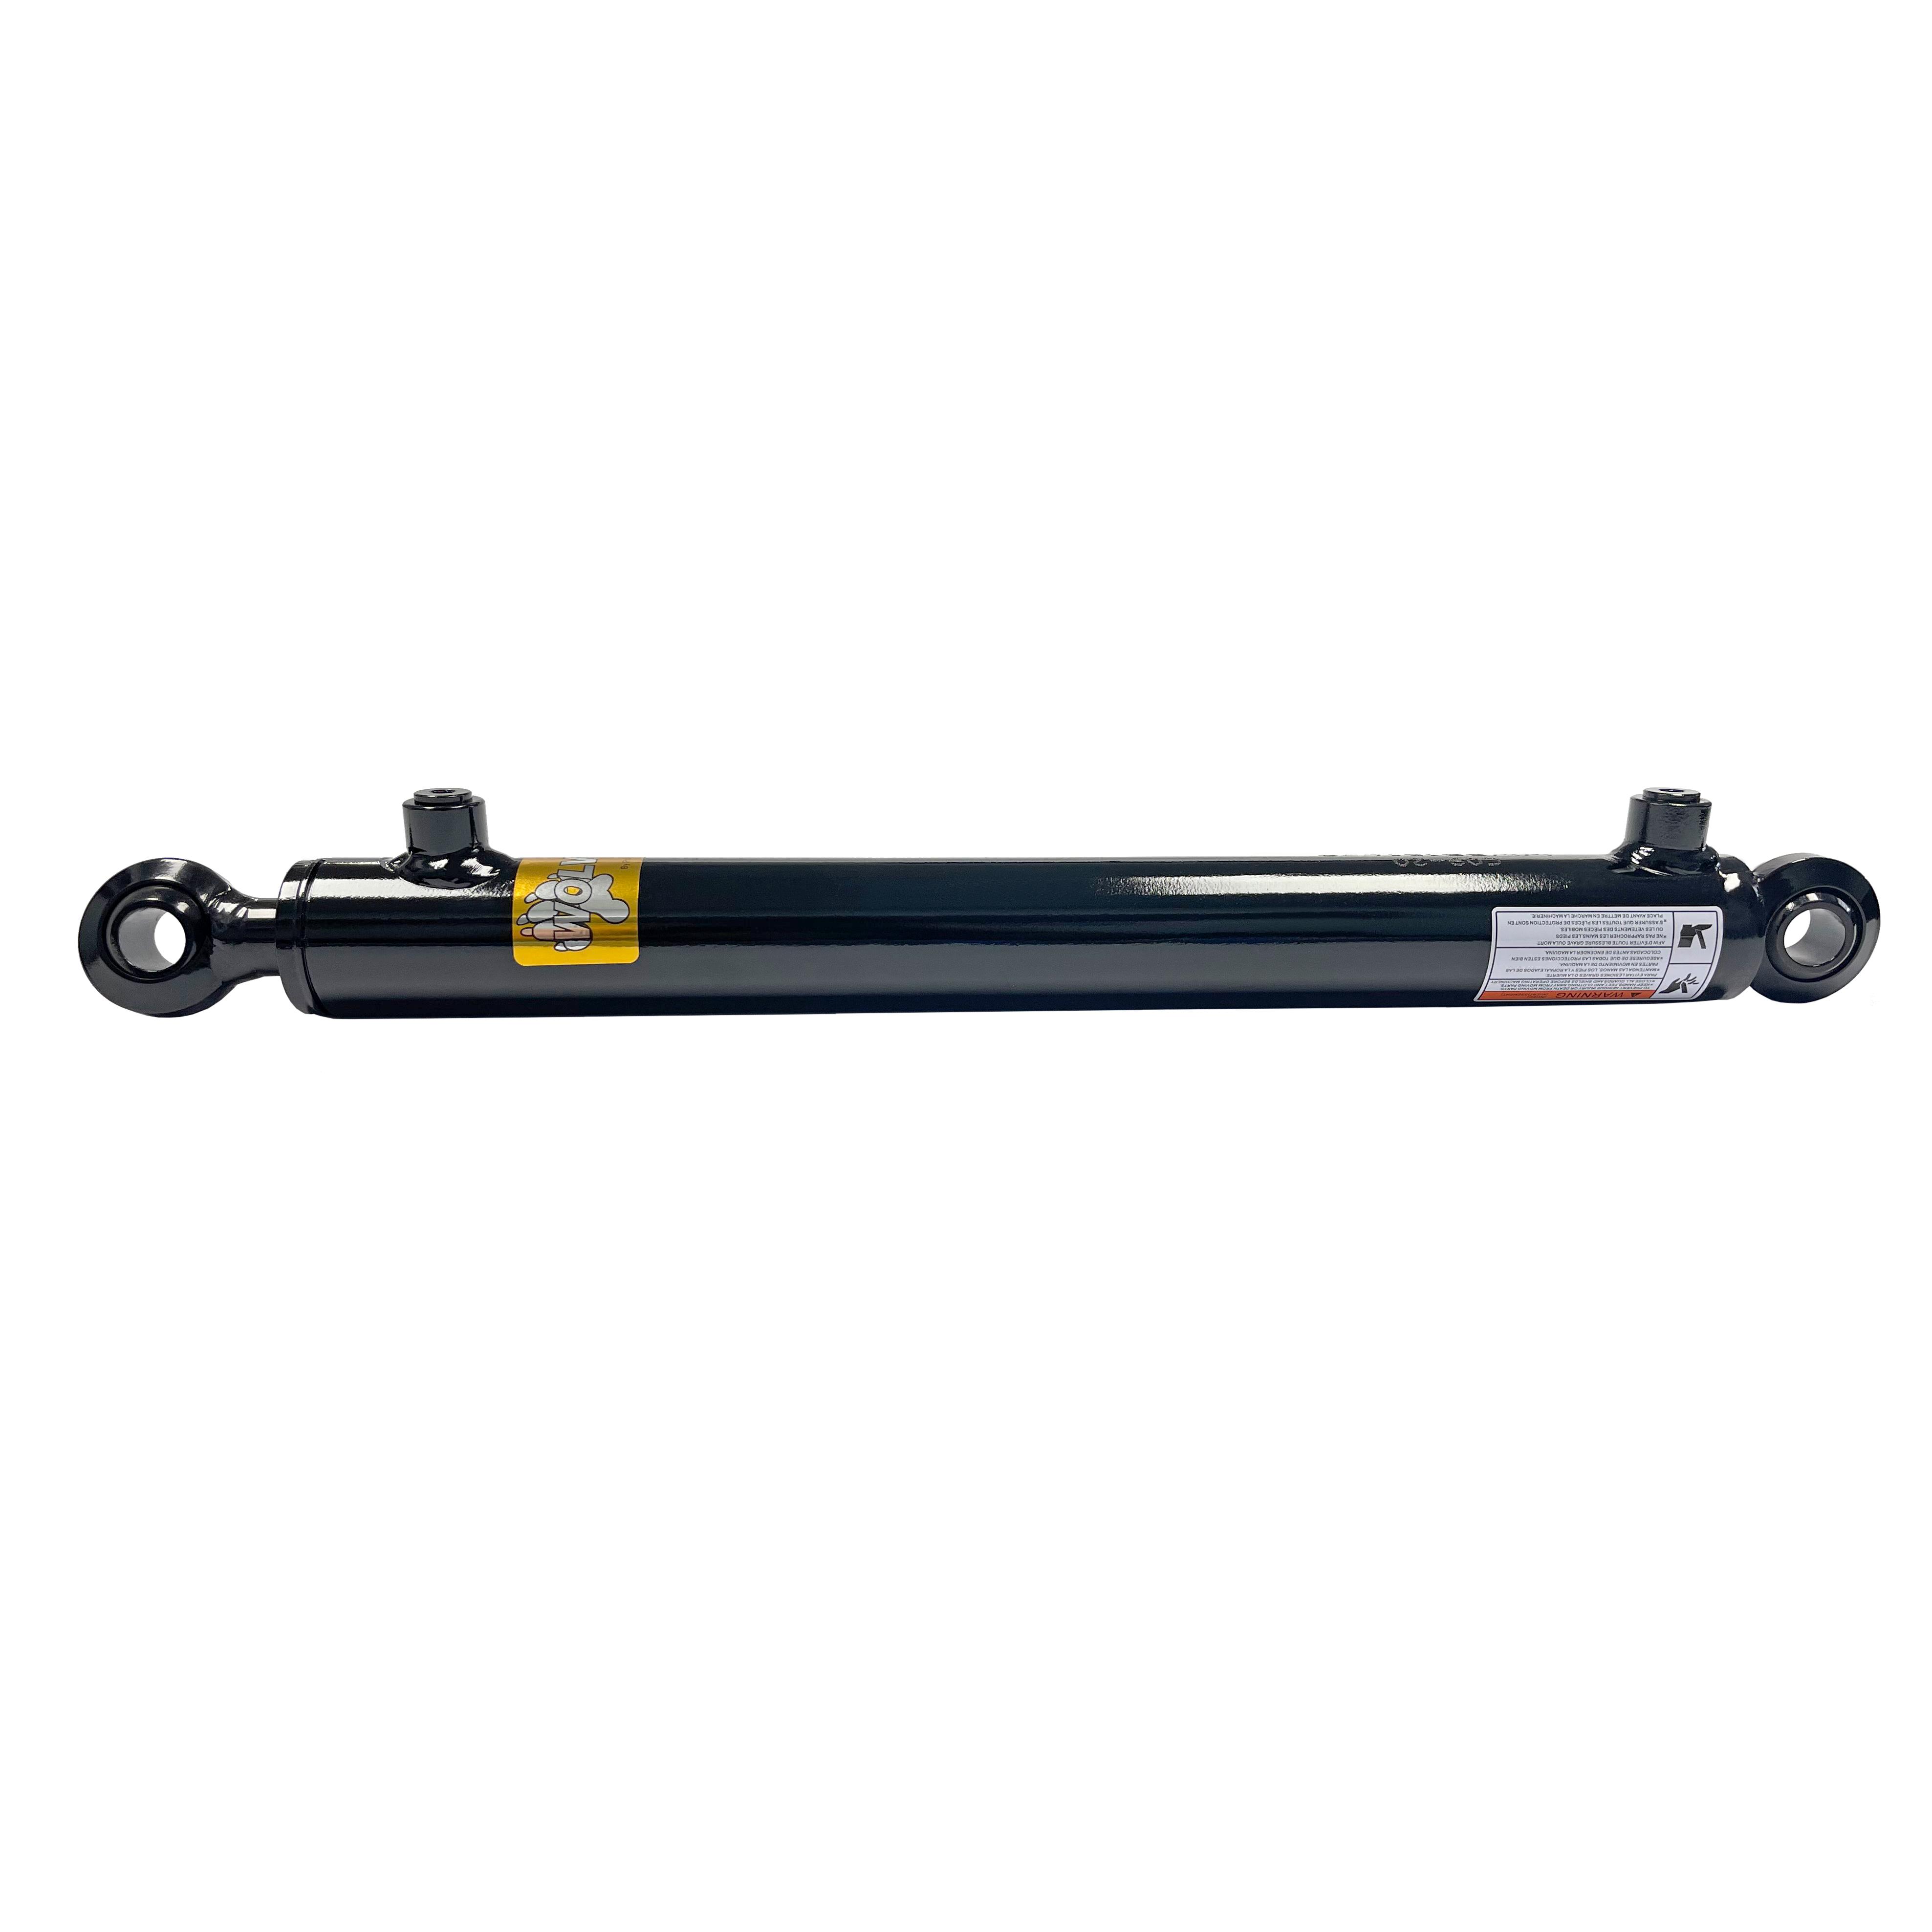 1.5 bore x 8 stroke swivel eye hydraulic cylinder, welded swivel eye double acting cylinder | Prince Hydraulics